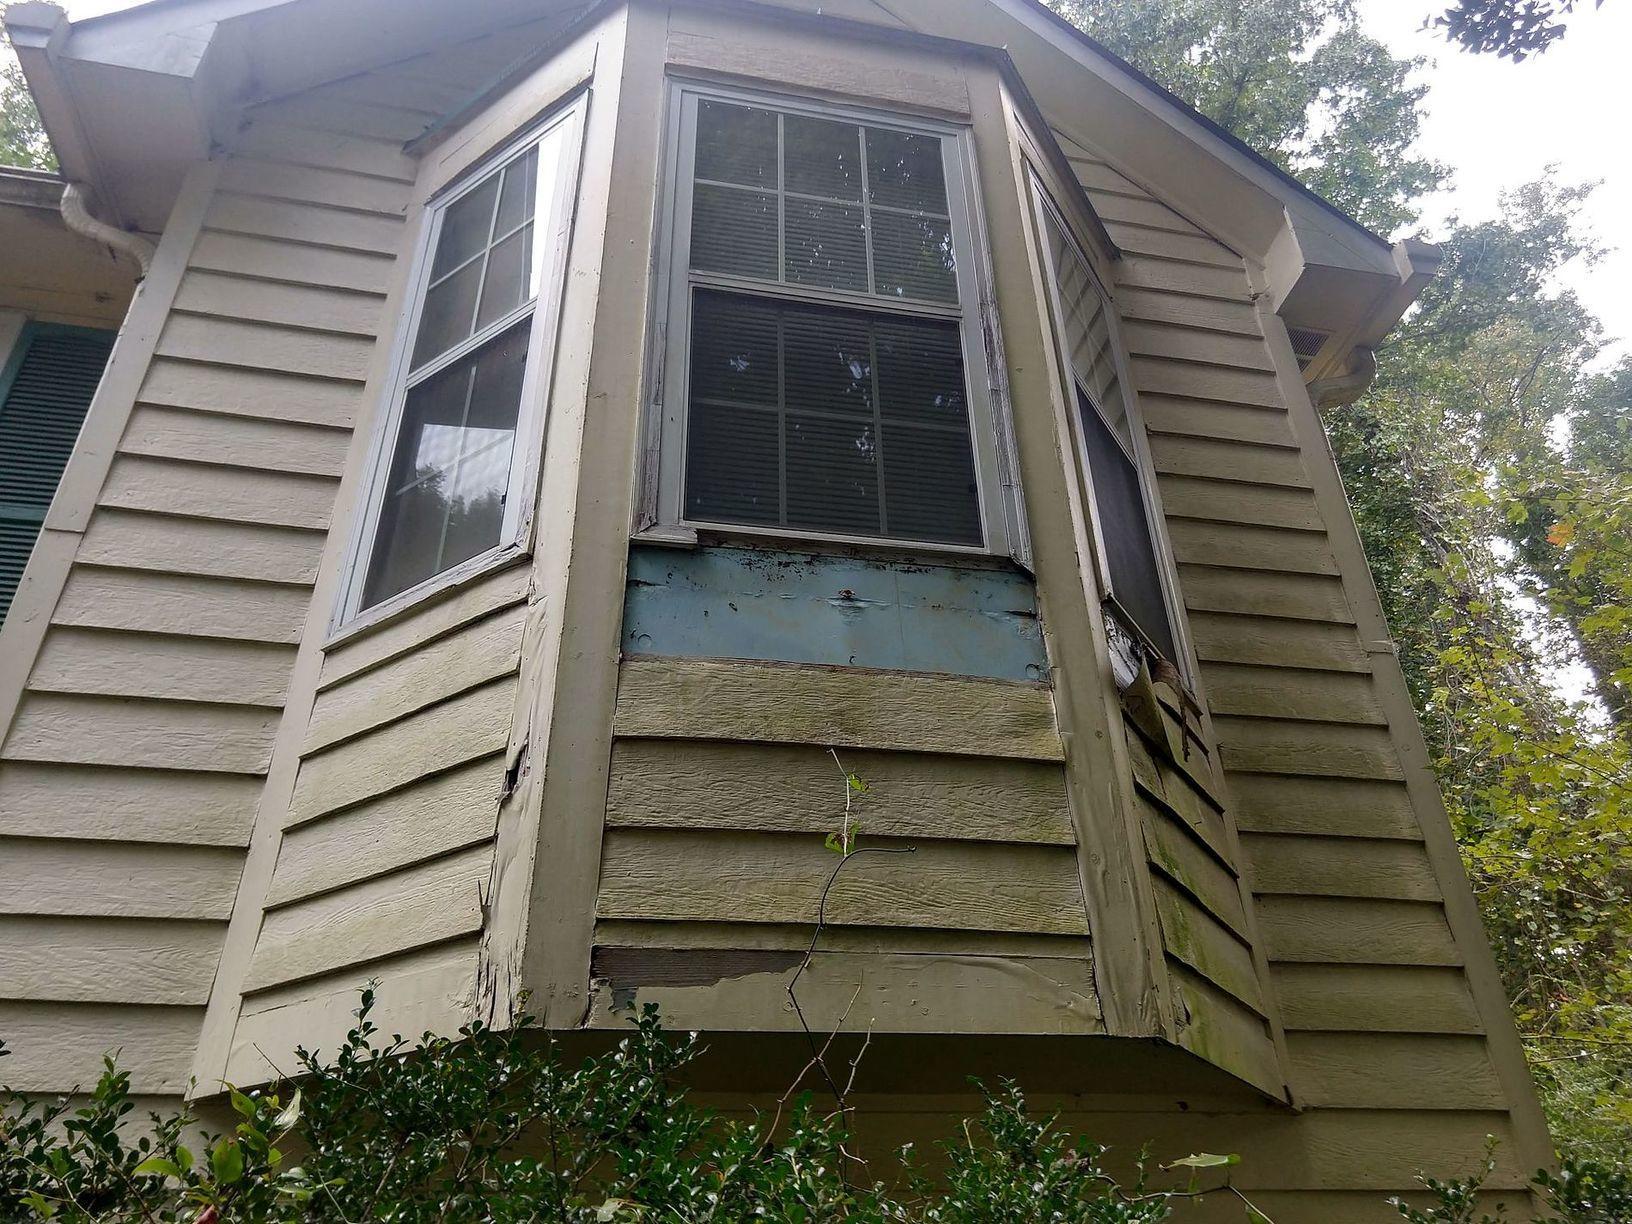 Siding Vinyl Siding Replacement In Ellenwood Georgia Damage To Siding And Window Trim